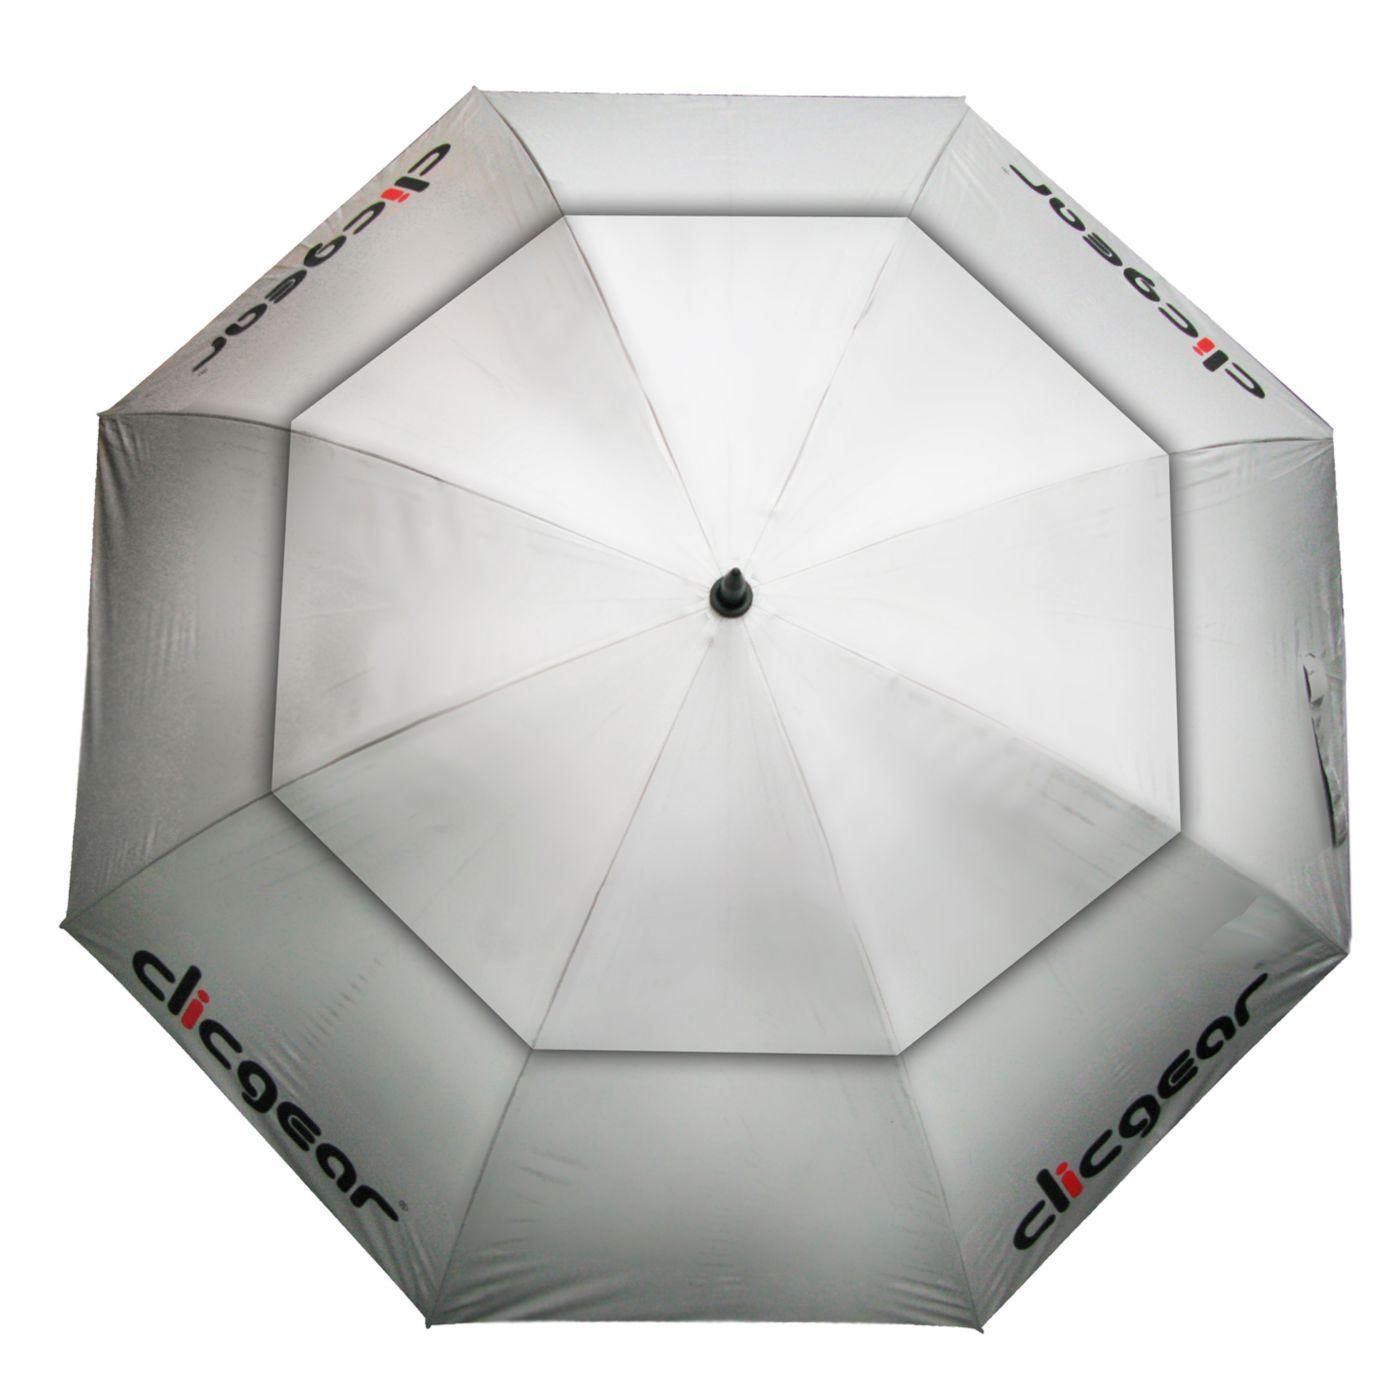 Clicgear Double Canopy 68'' Umbrella